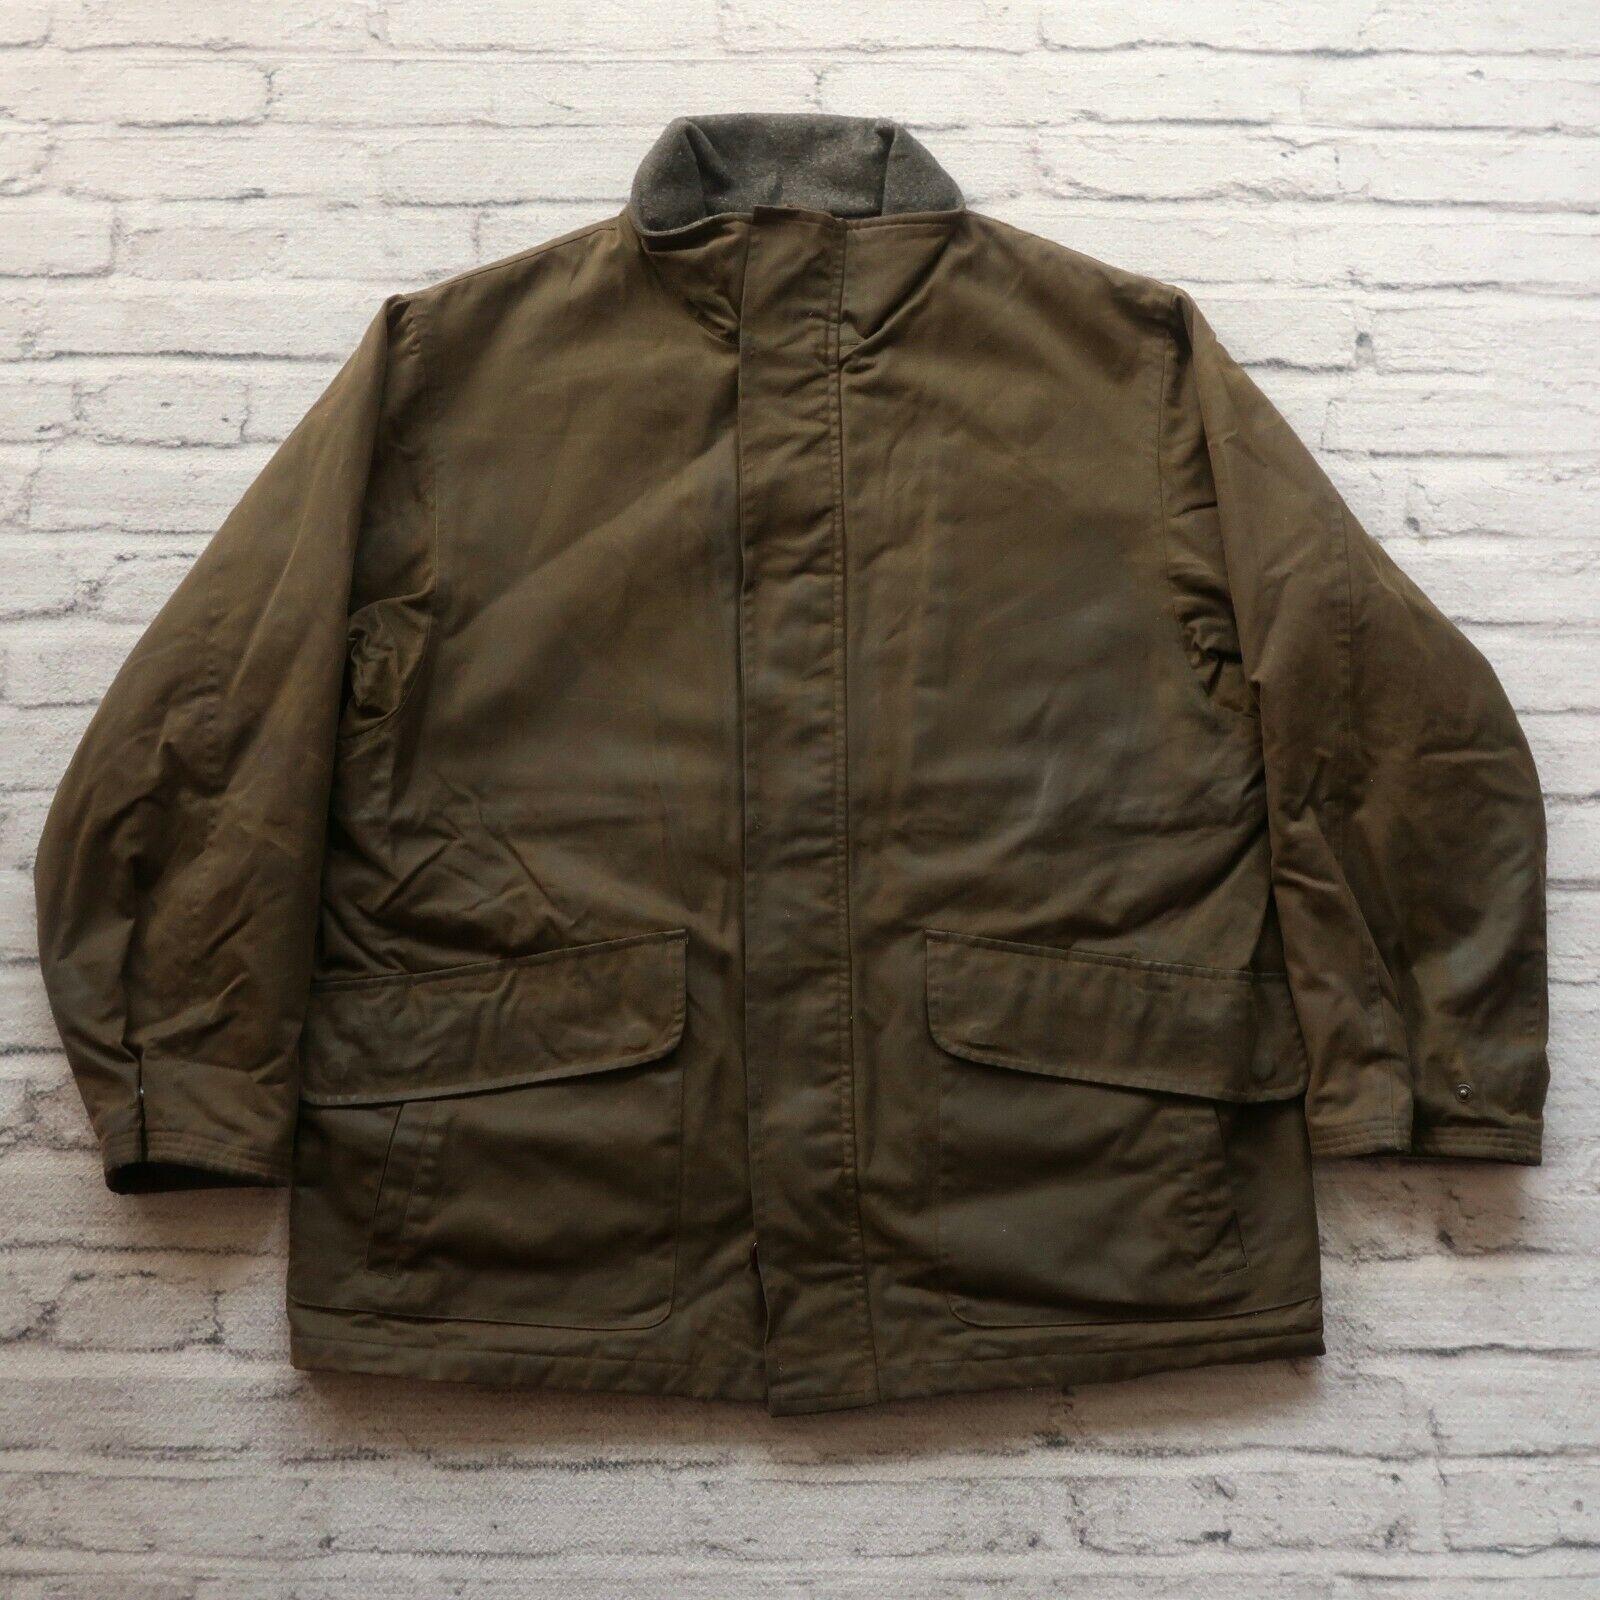 Vintage Polo Ralph Lauren Wax Jacket Größe L Grün Hunting